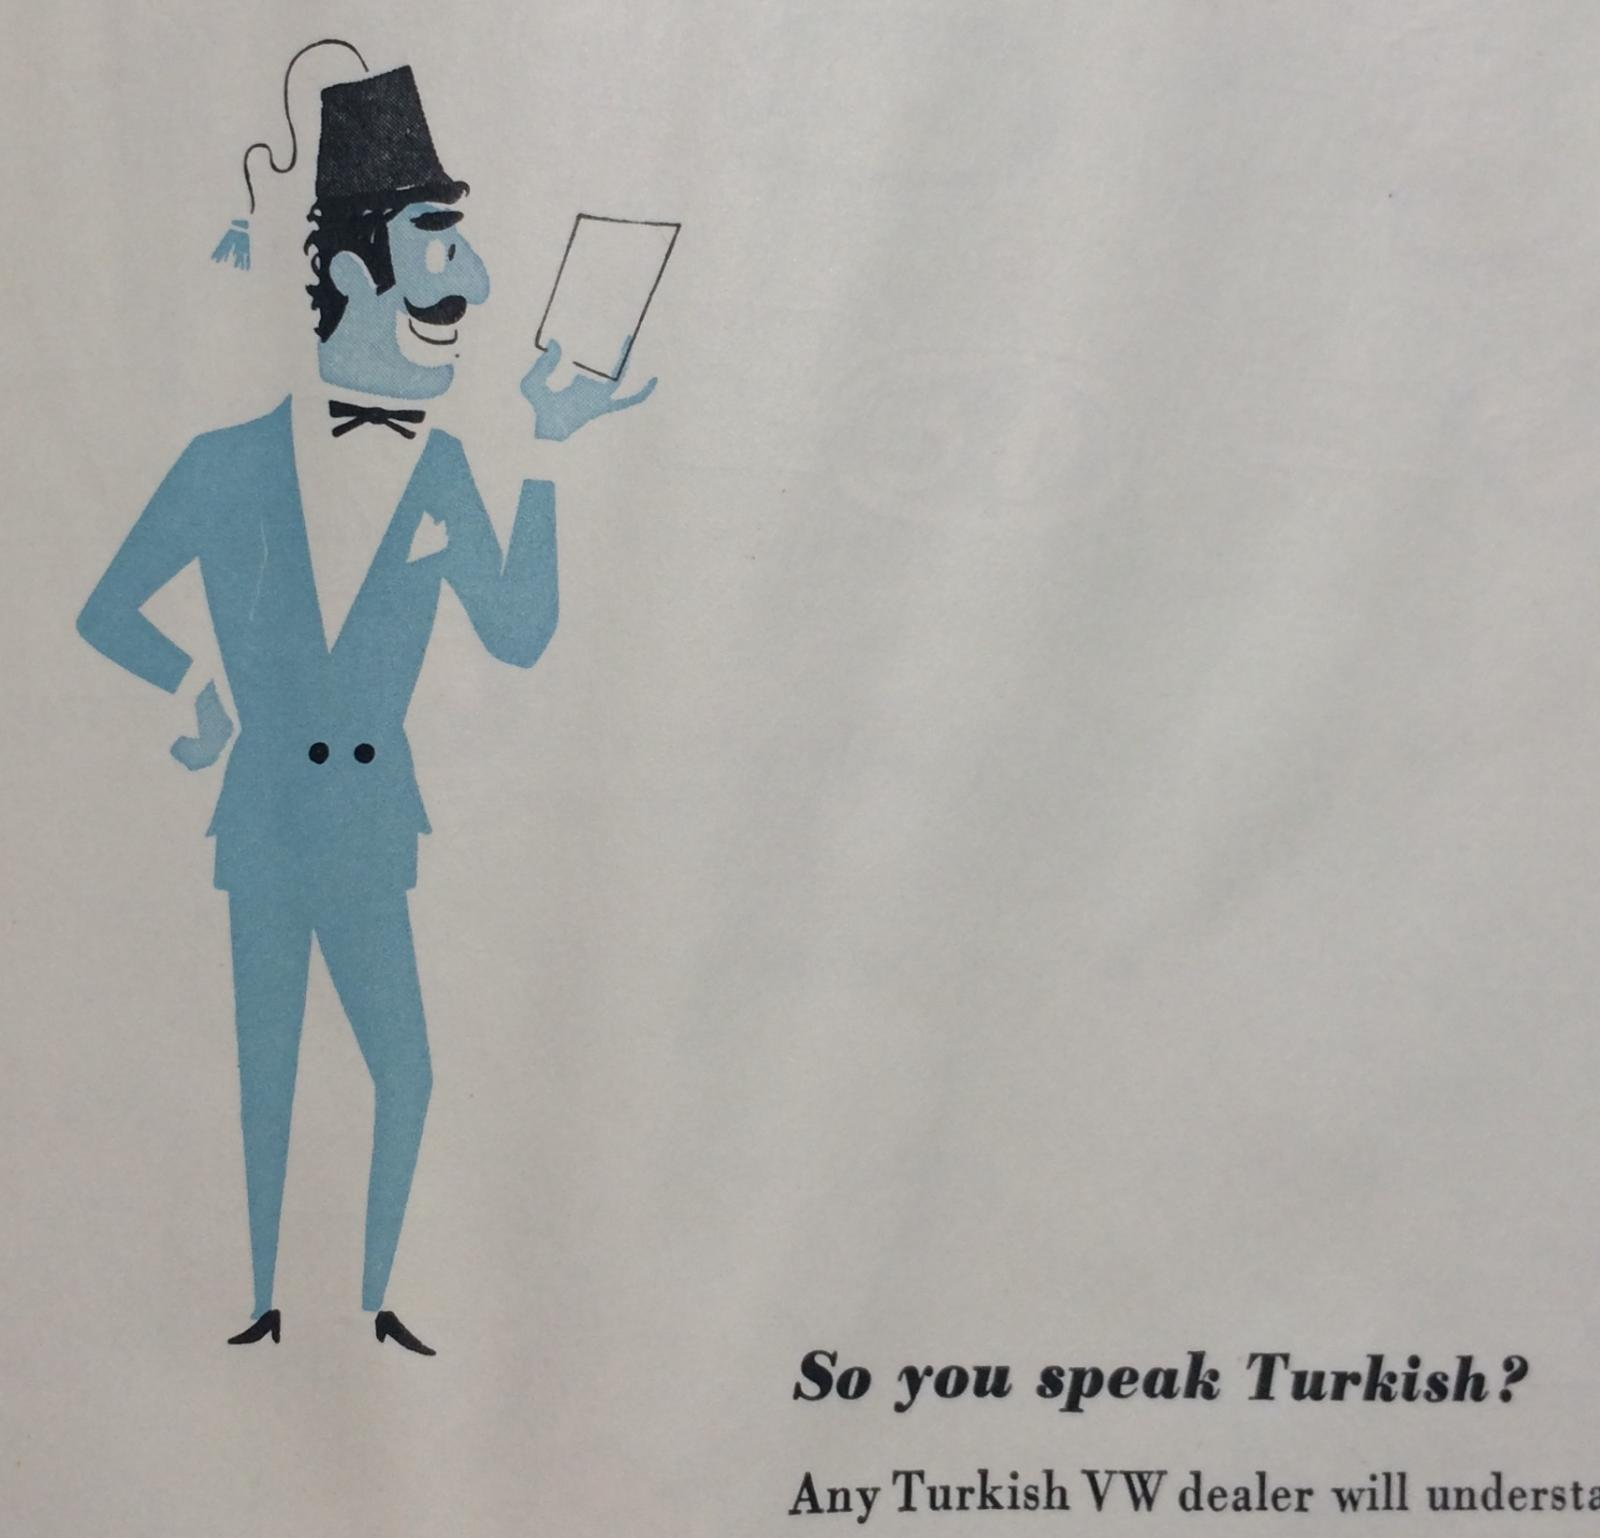 Turkis Turquoise L380 (Turkish is a language)